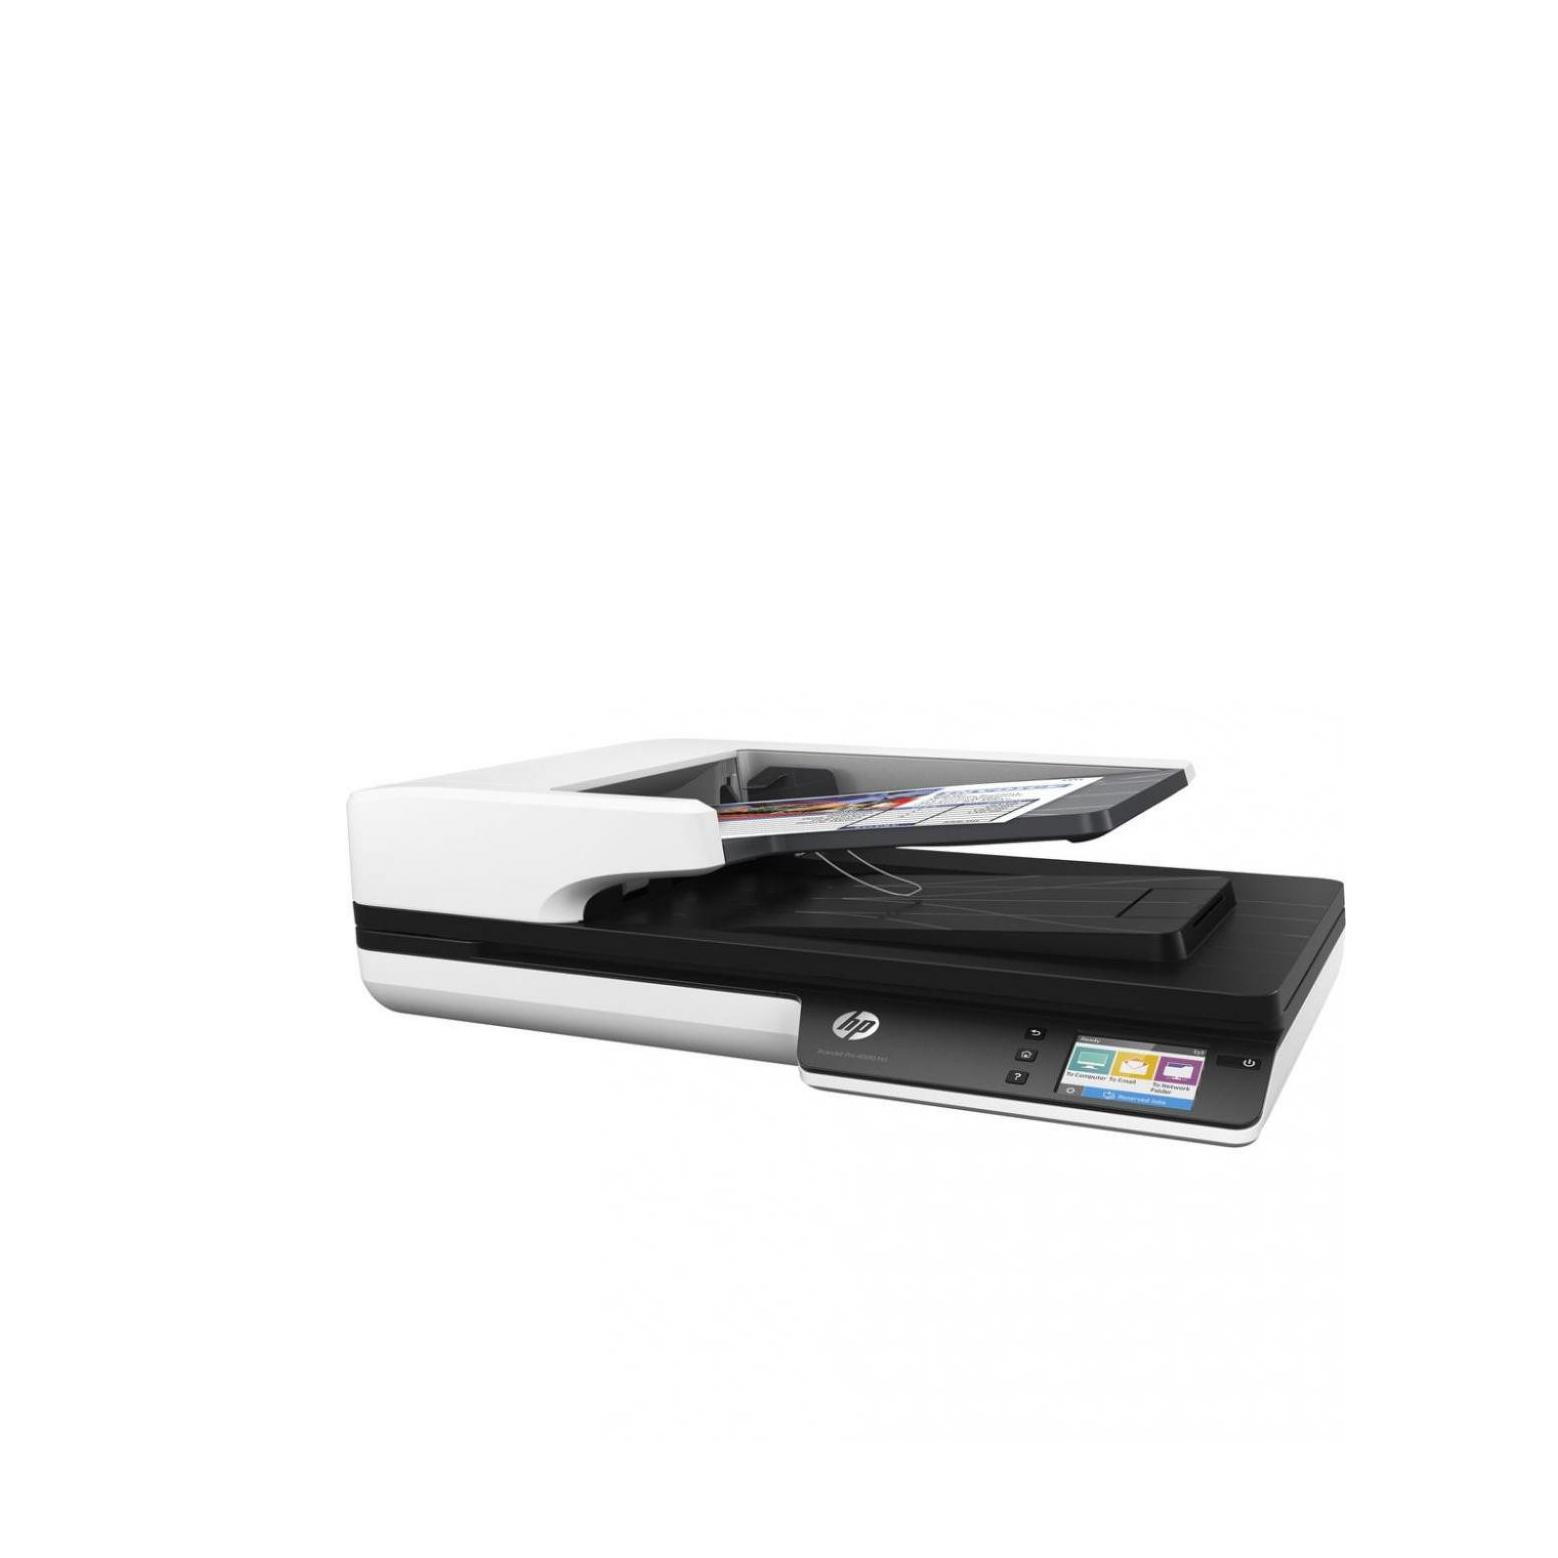 Планшетный сканер ScanJet Pro 4500 fn1 L2749A